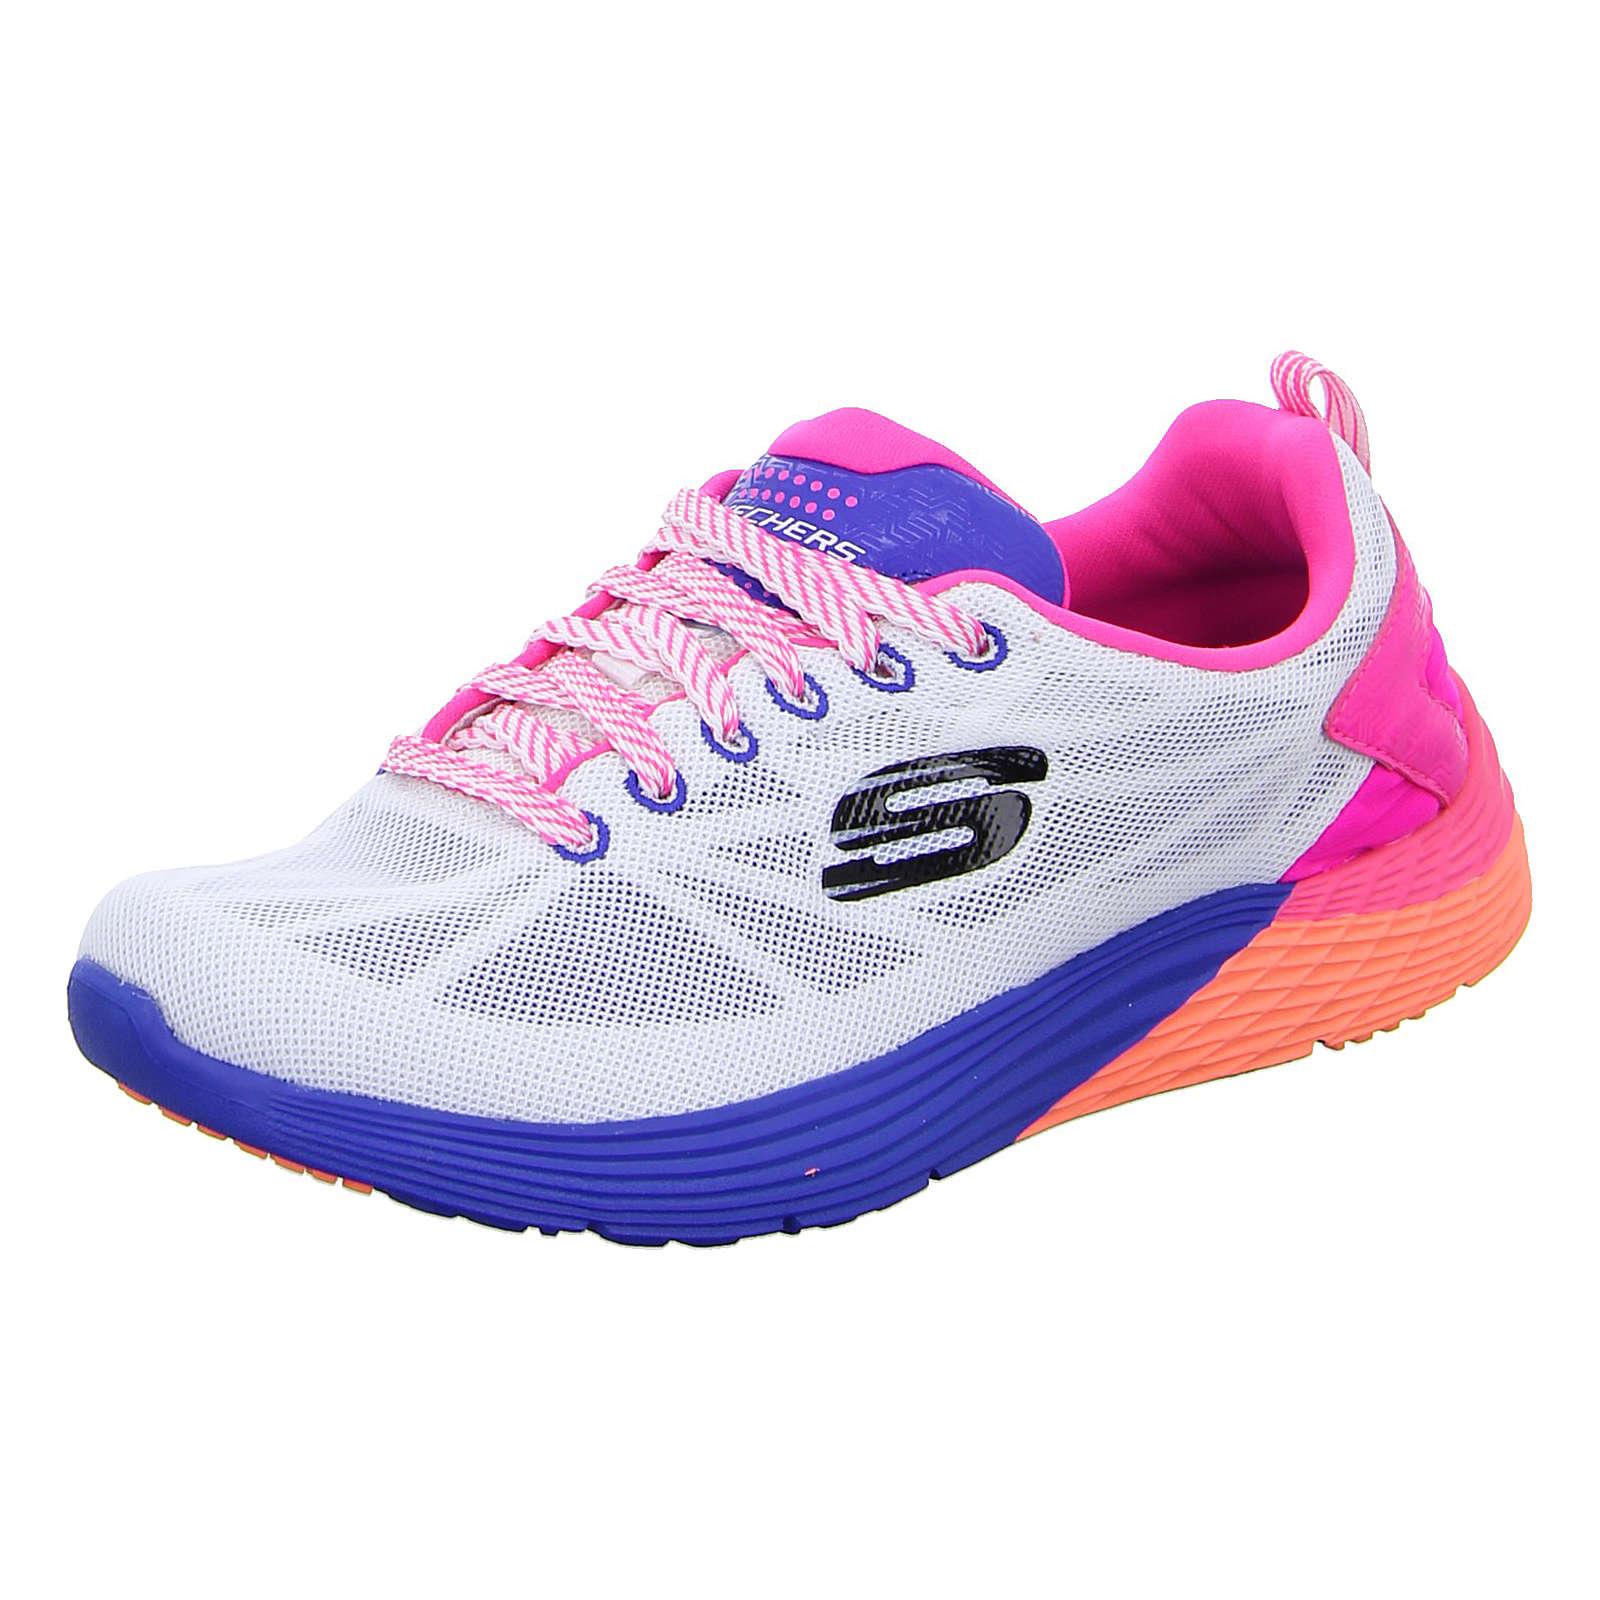 SKECHERS Damen Sneaker Valeris Front Page mehrfarbig Damen Gr. 36